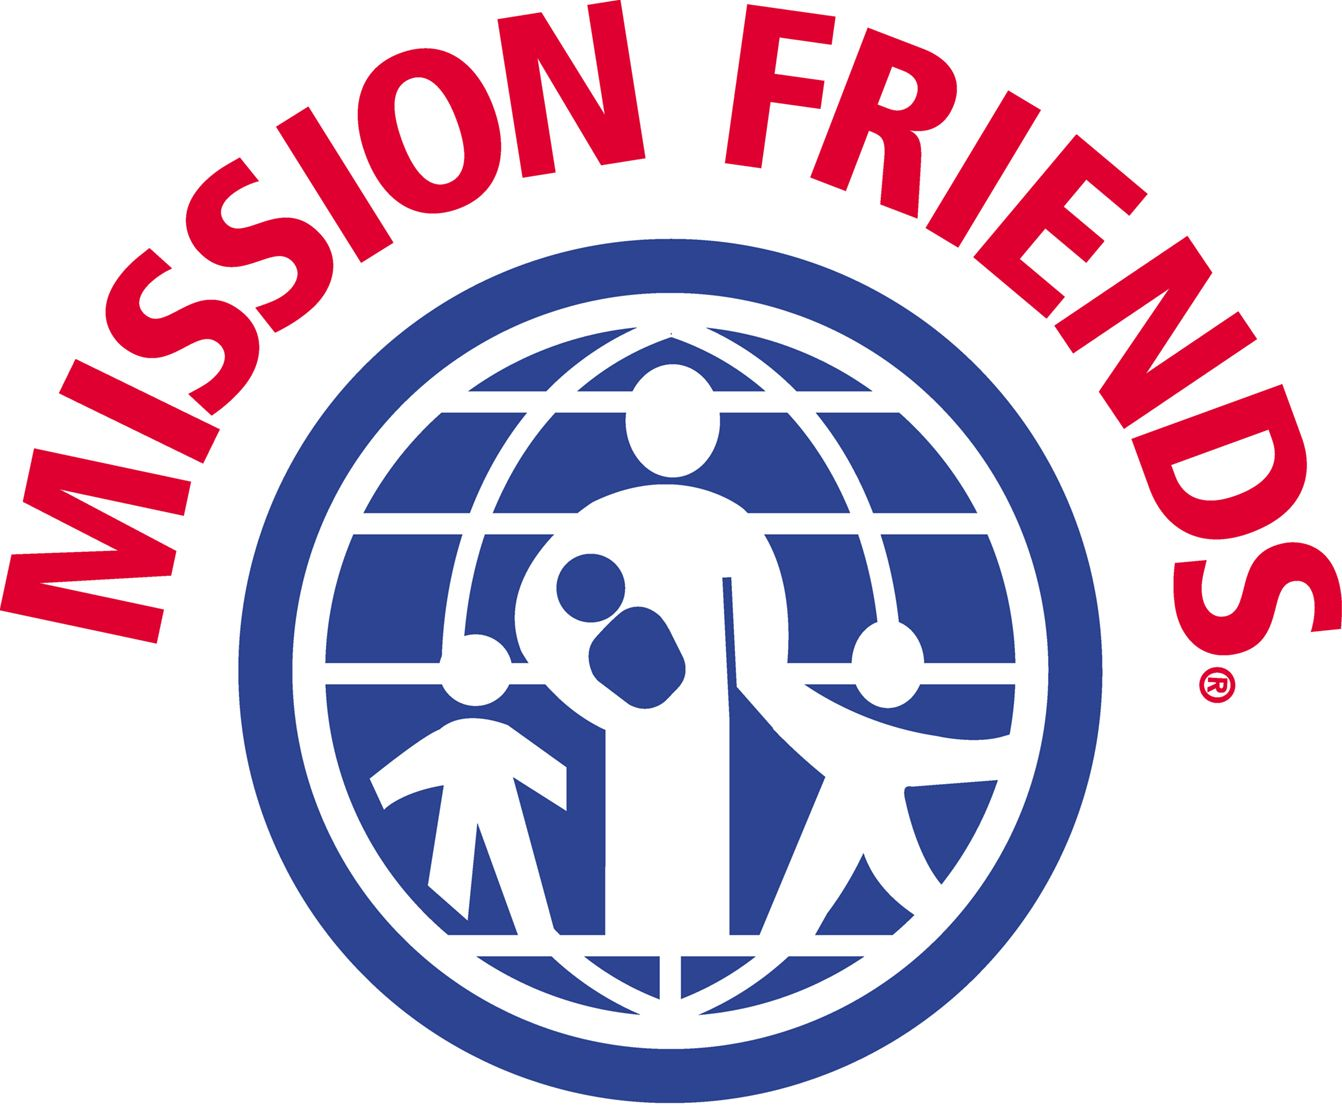 Mission Friends For Children Childrens Church Childrens Ministry Mission